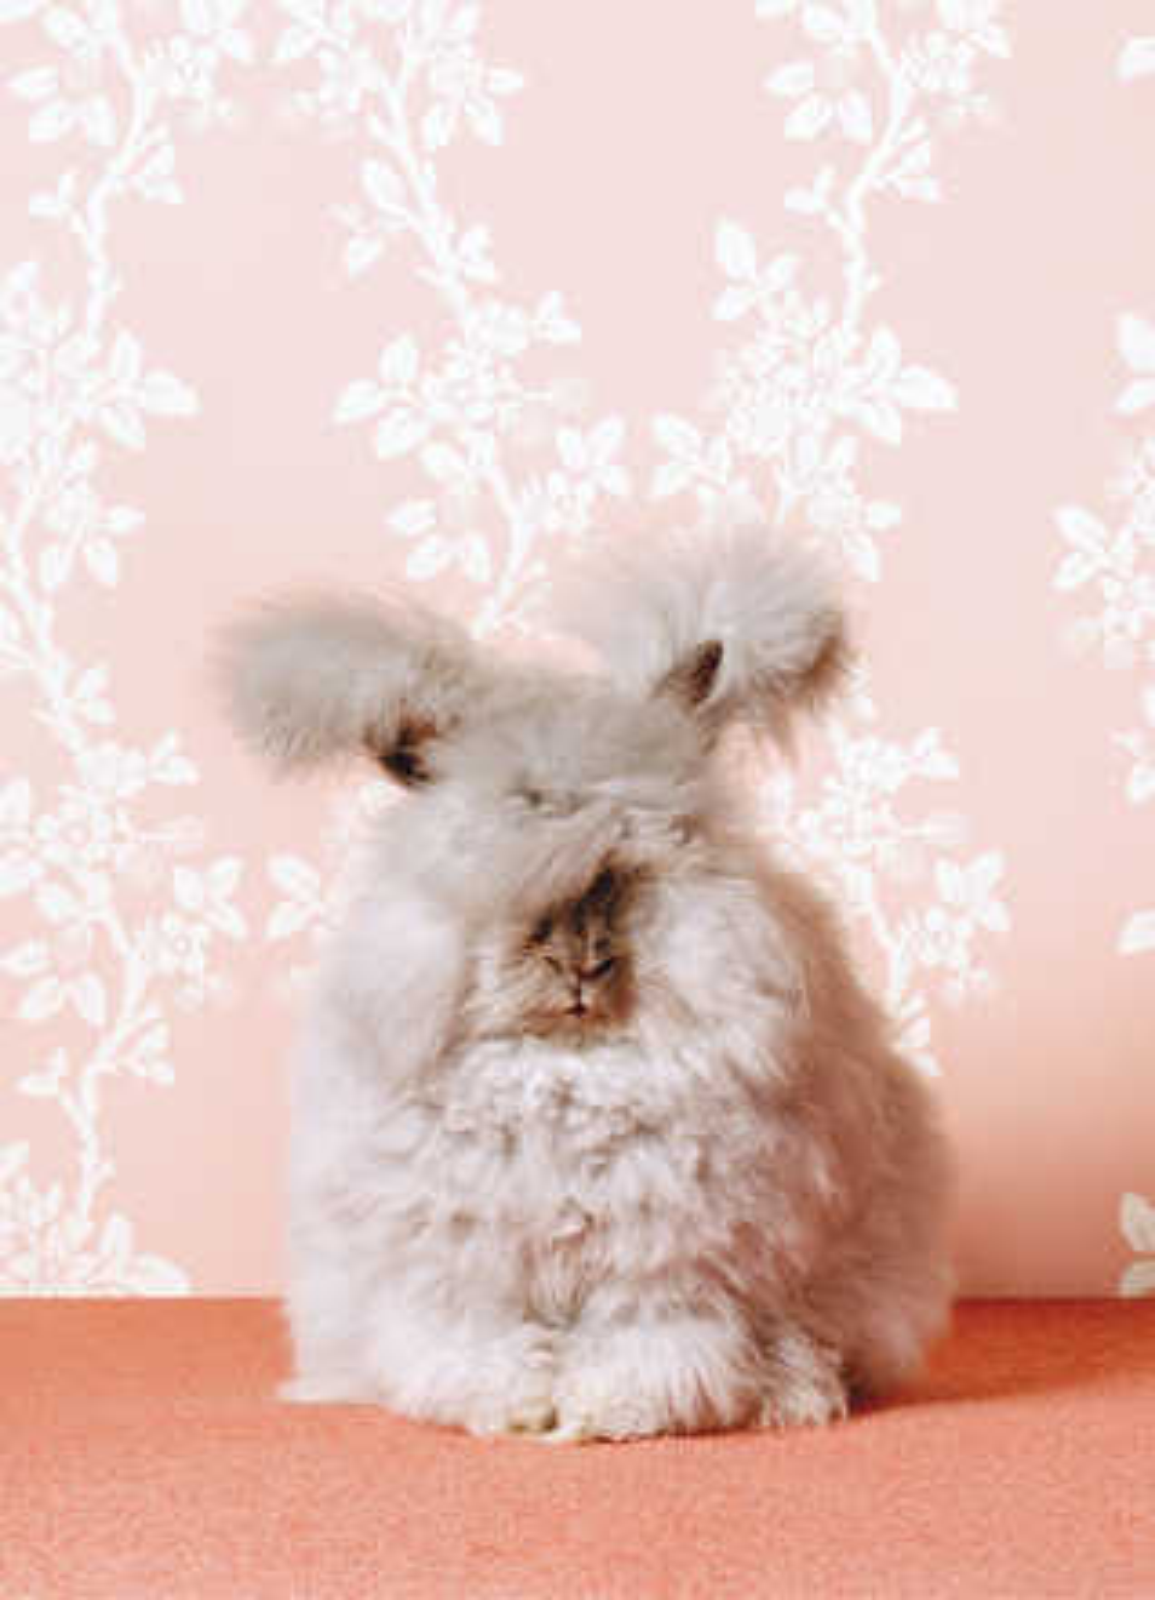 Fluffy Bunny - Catherine Ledner